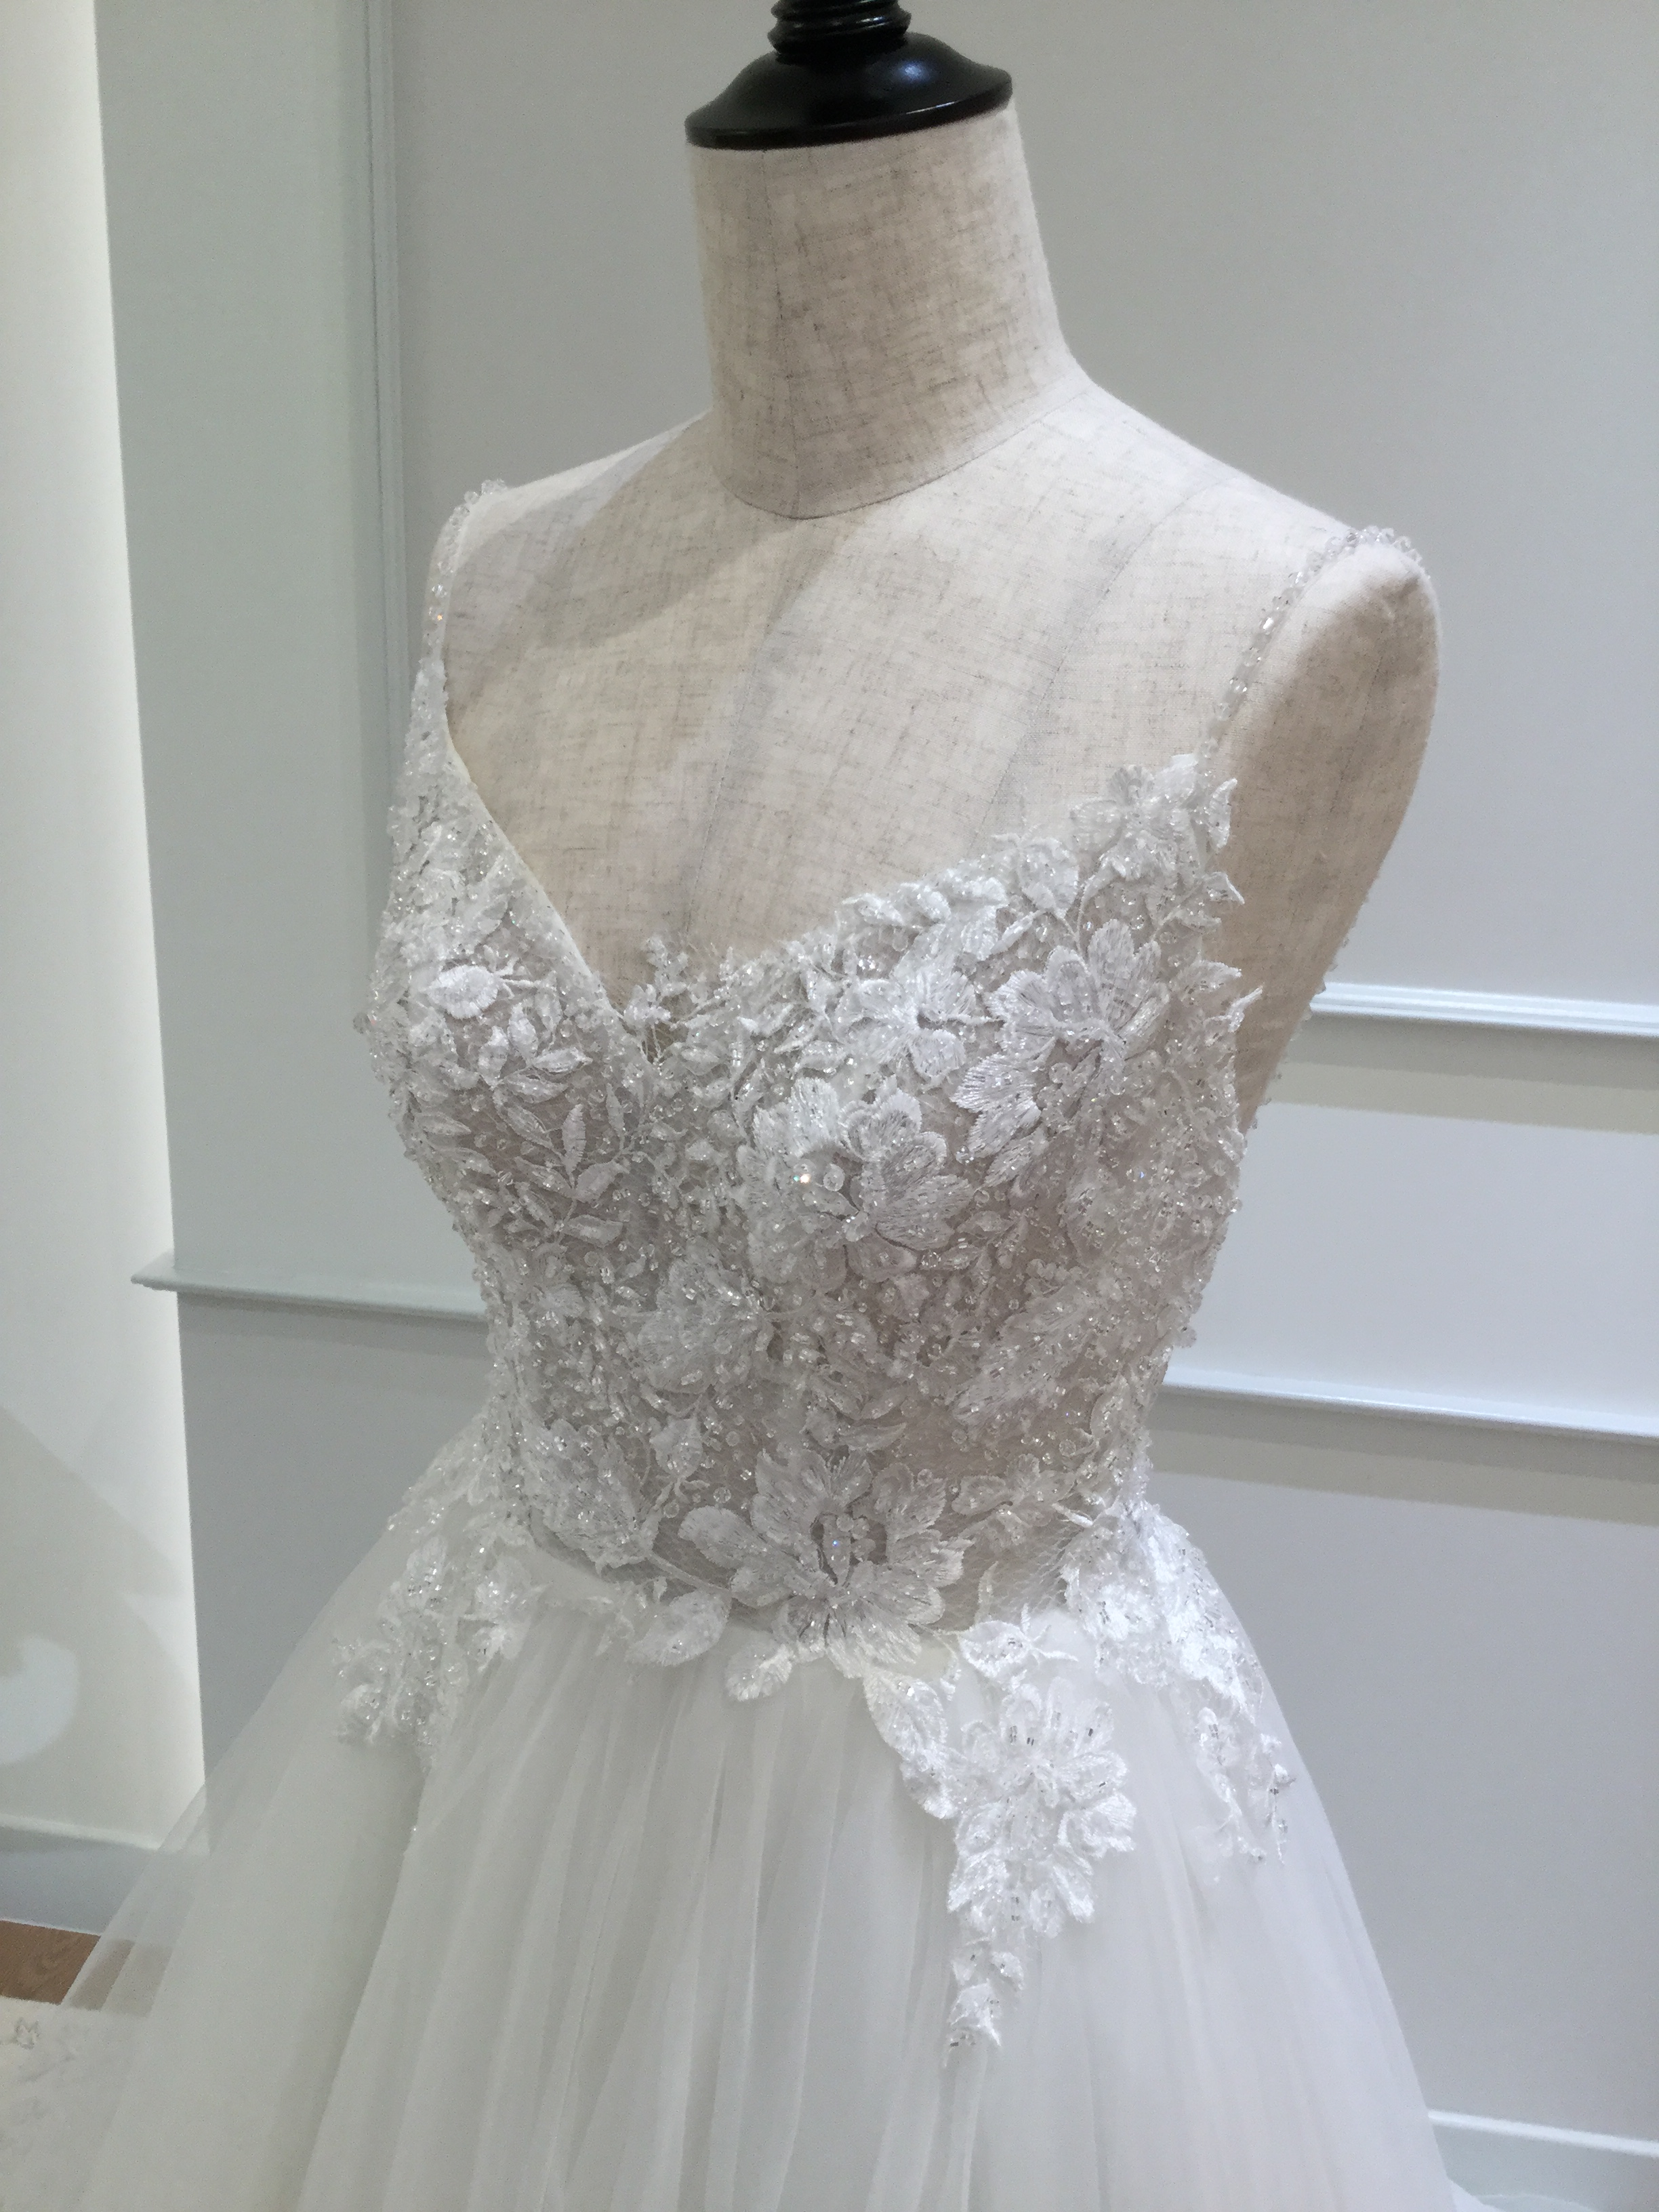 CATLIN   カテリーン  チュールドレス ビジュー グランマニエのウエディングドレス